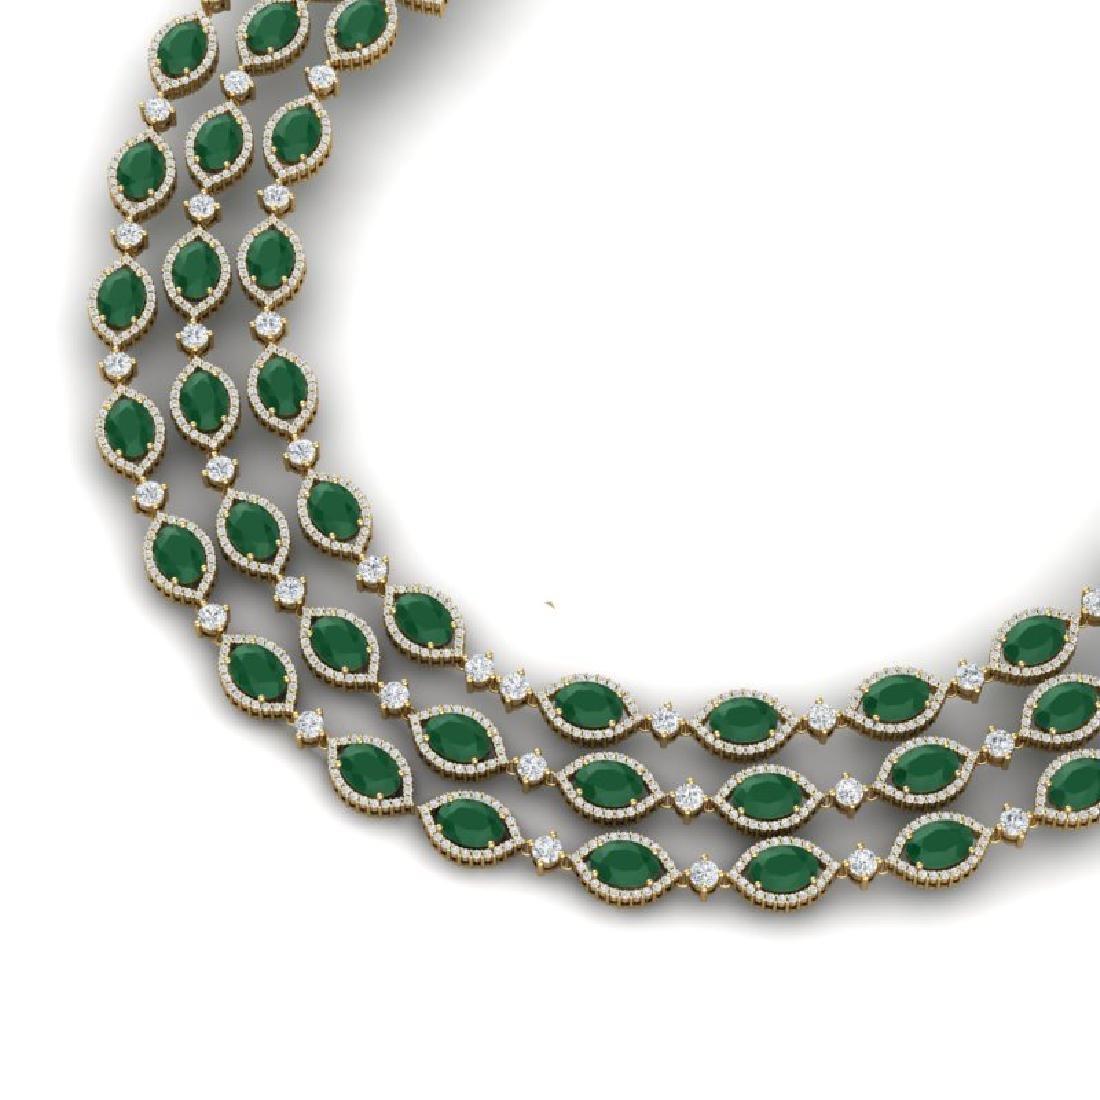 85.81 CTW Royalty Emerald & VS Diamond Necklace 18K